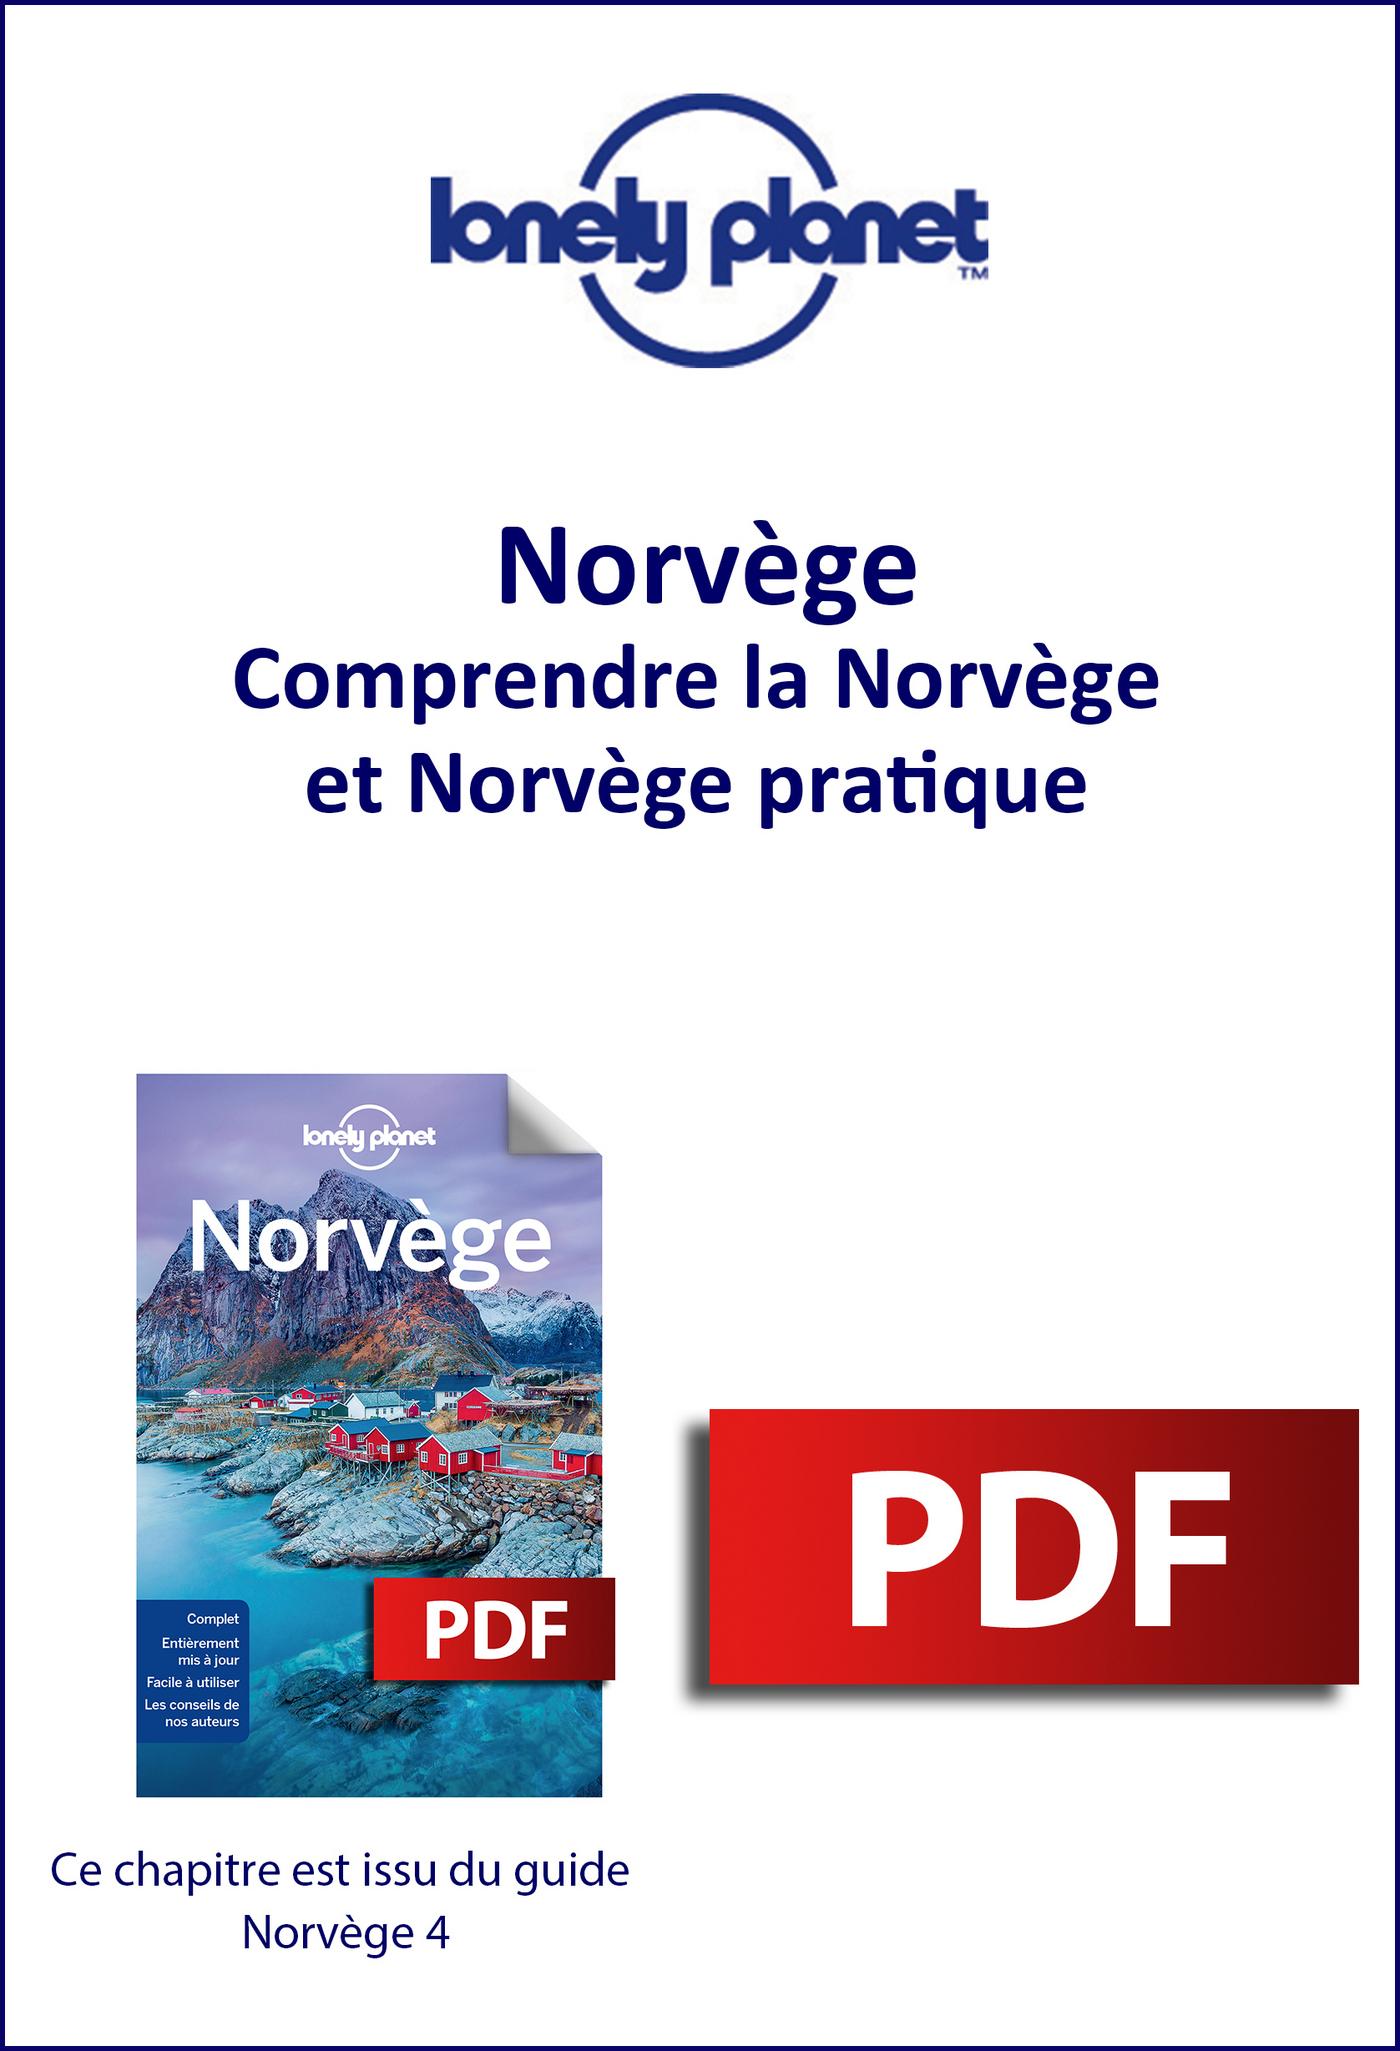 Norvège - Comprendre la Norvège et Norvège pratique